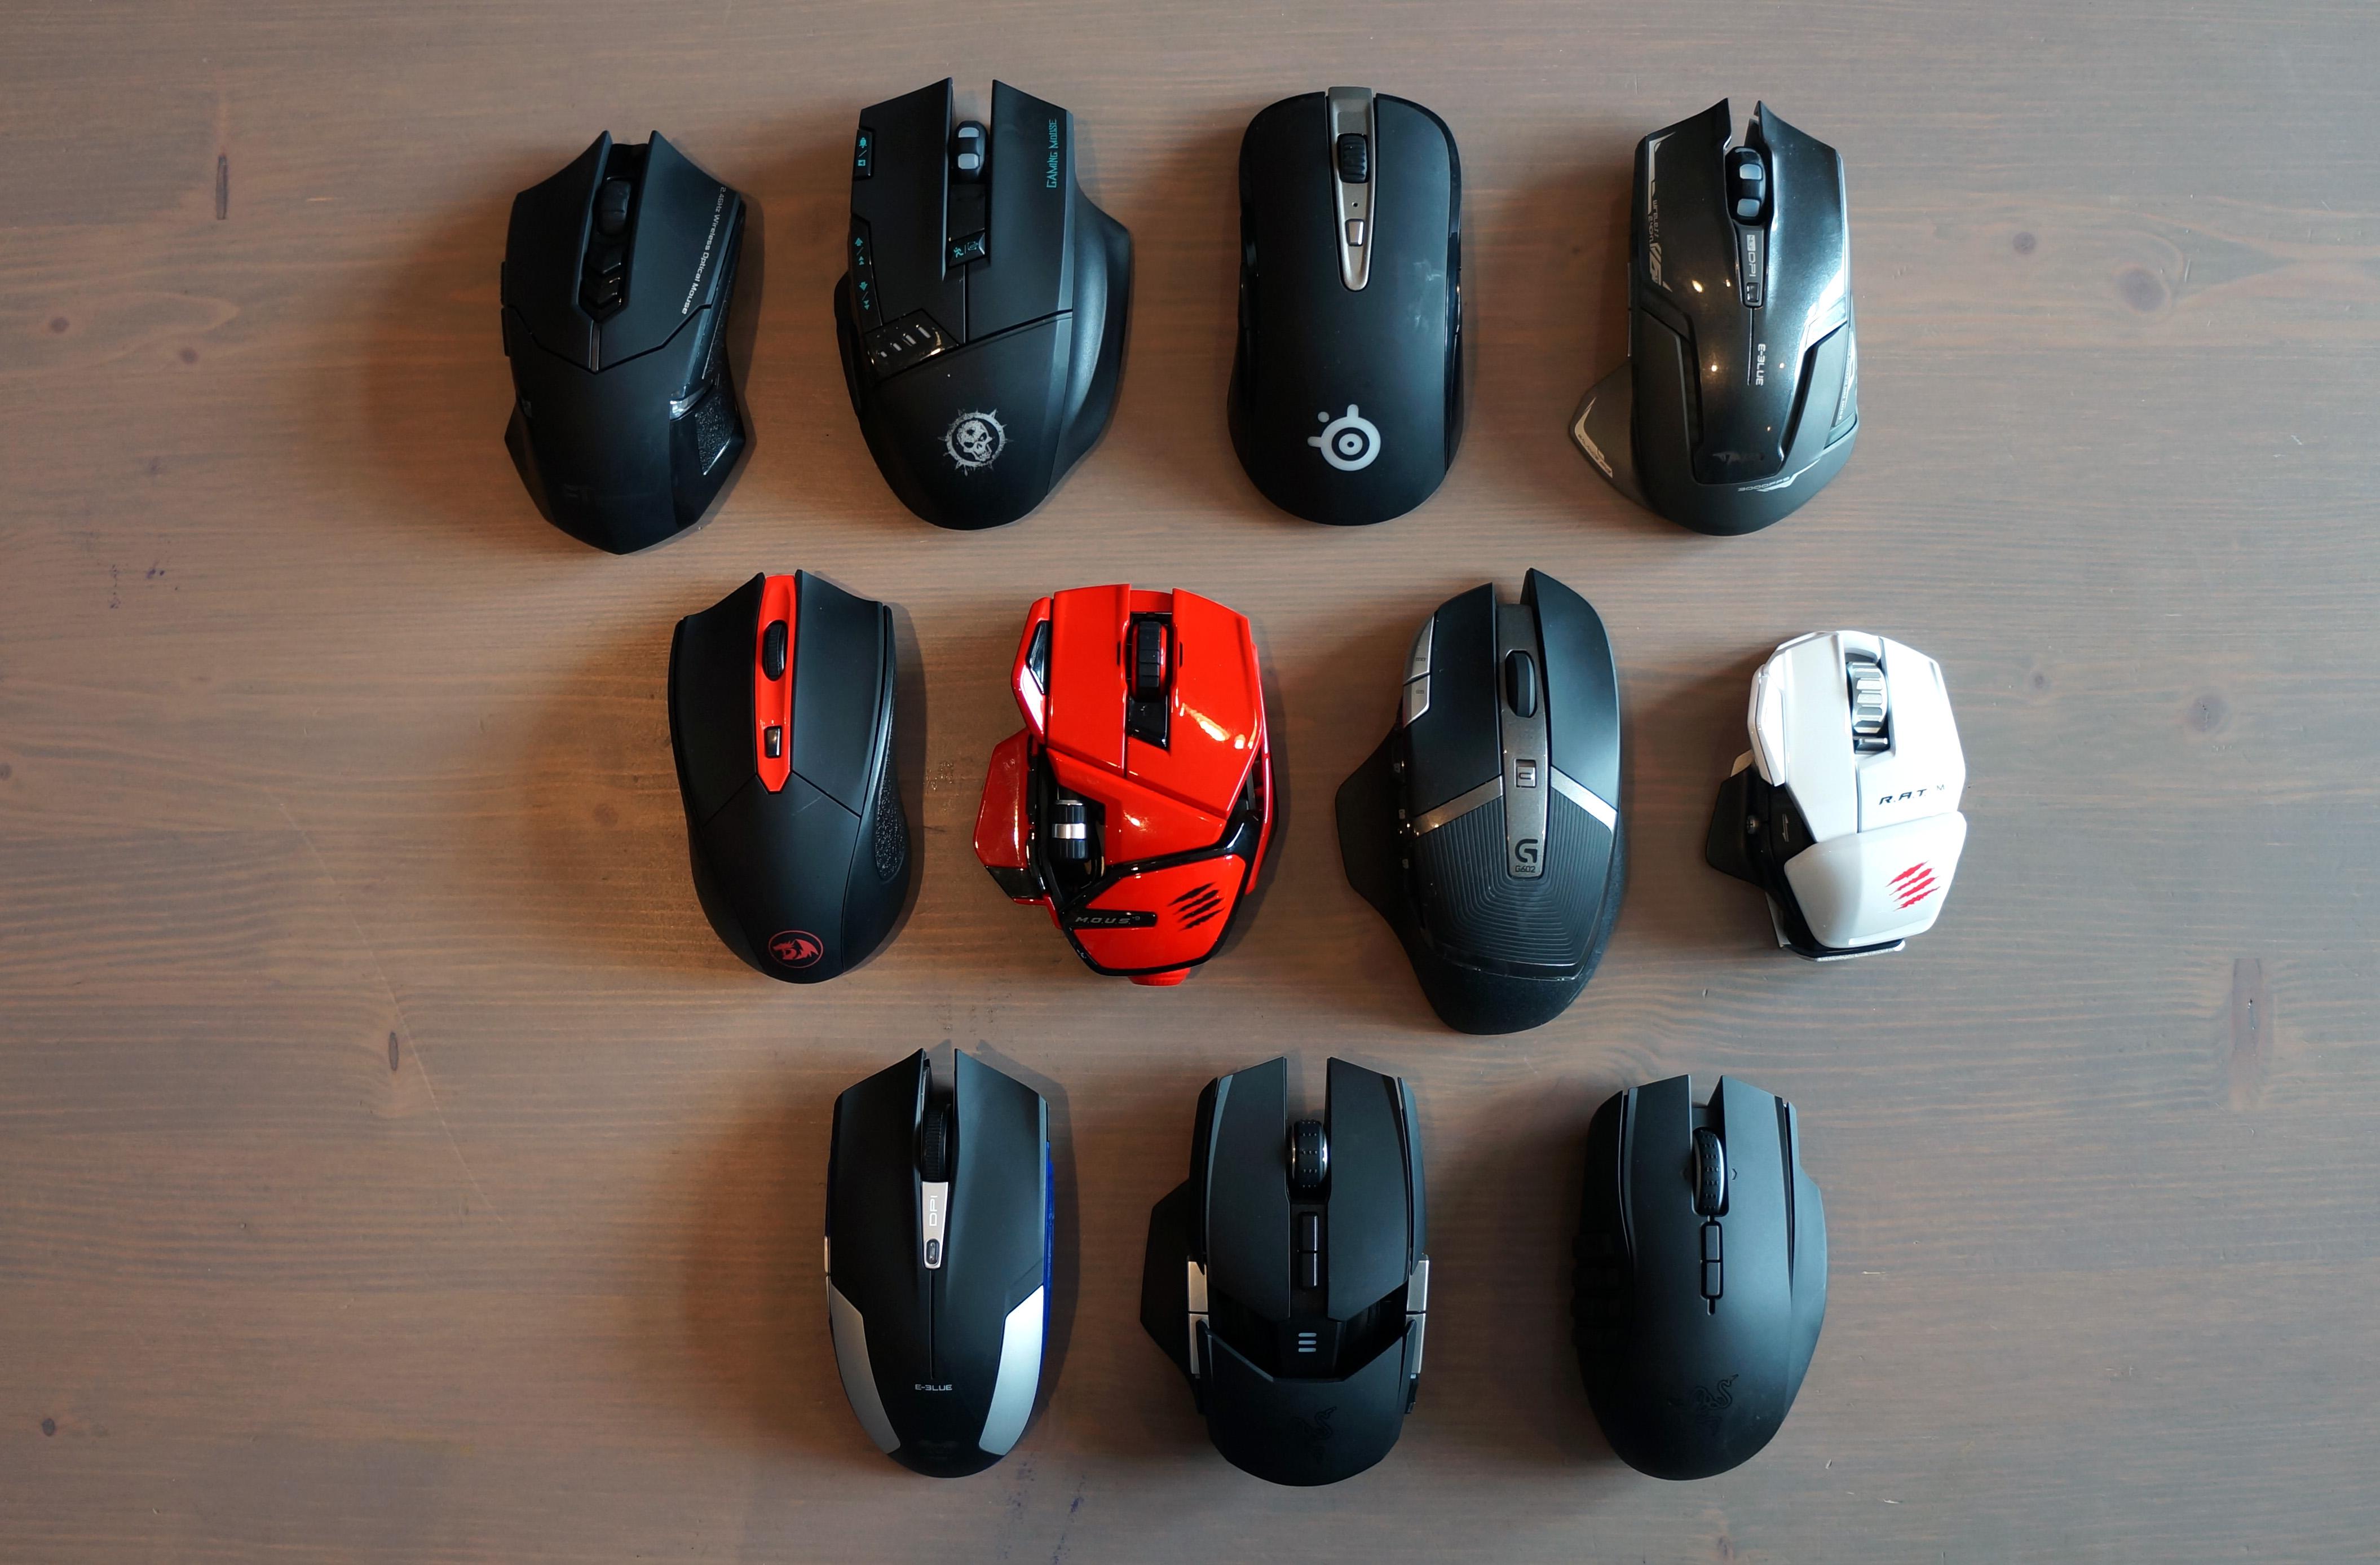 Best Wireless Gaming Mice